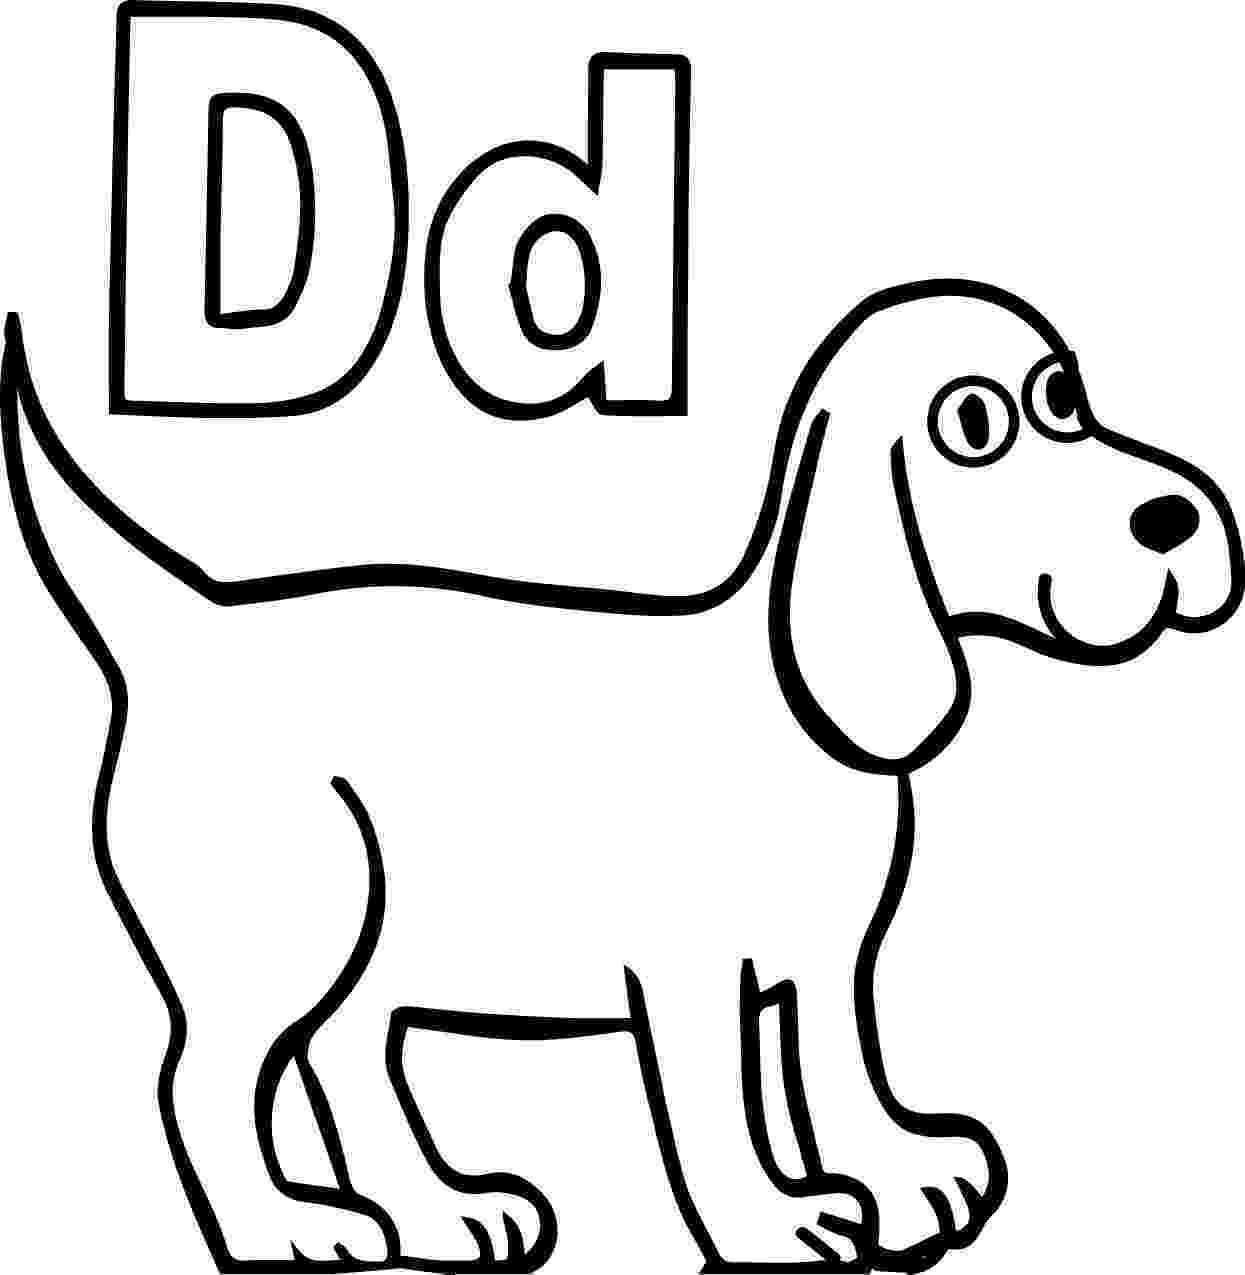 dog coloring pages for preschoolers preschool dog coloring pages wecoloringpagecom coloring pages preschoolers dog for